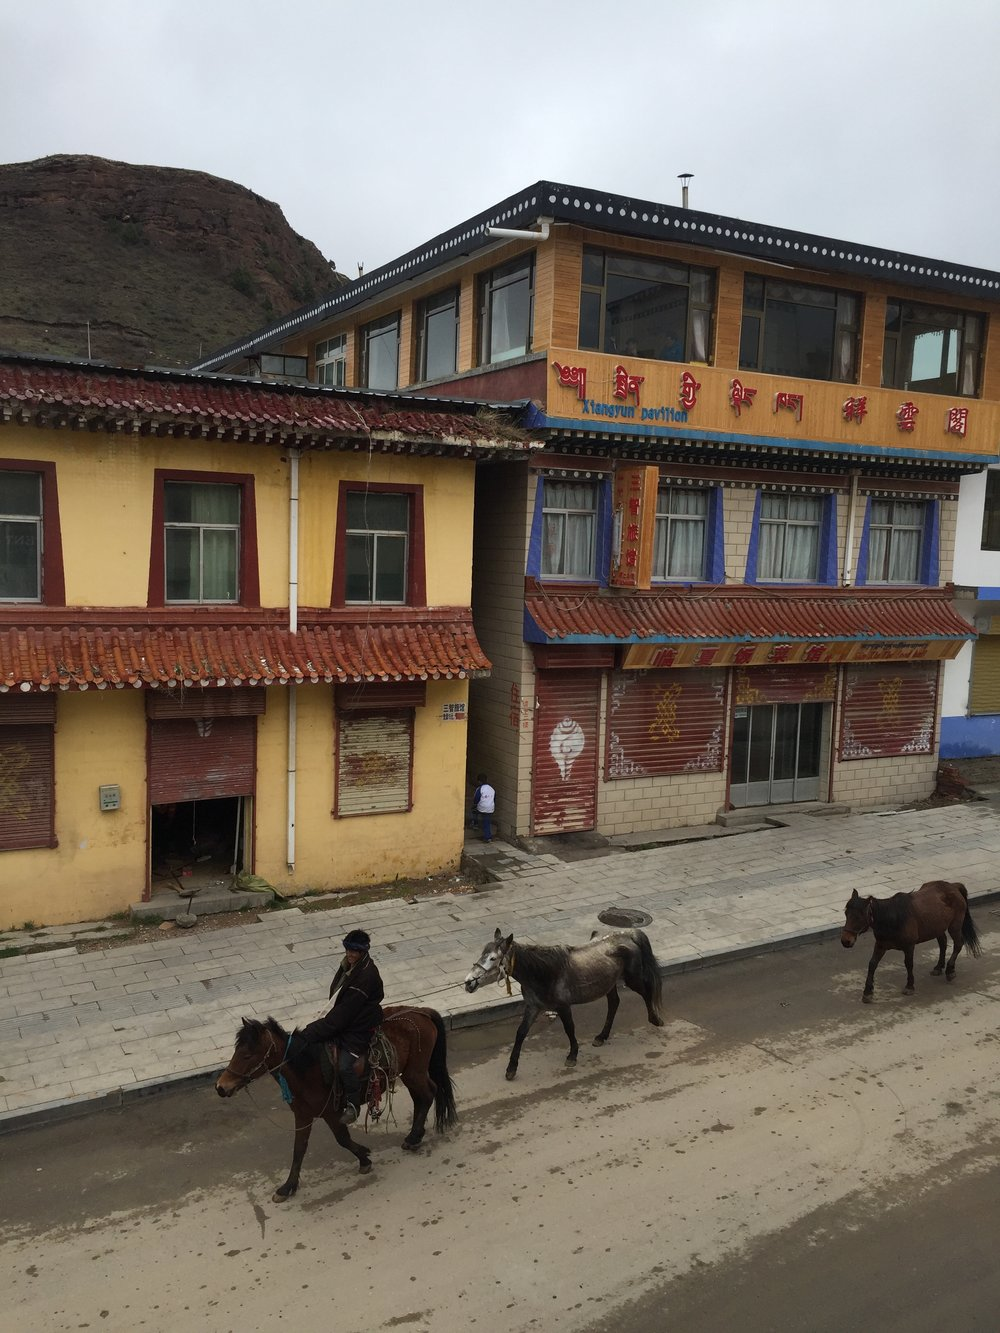 Tibetan cowboy riding down the main street of Langmusi town.